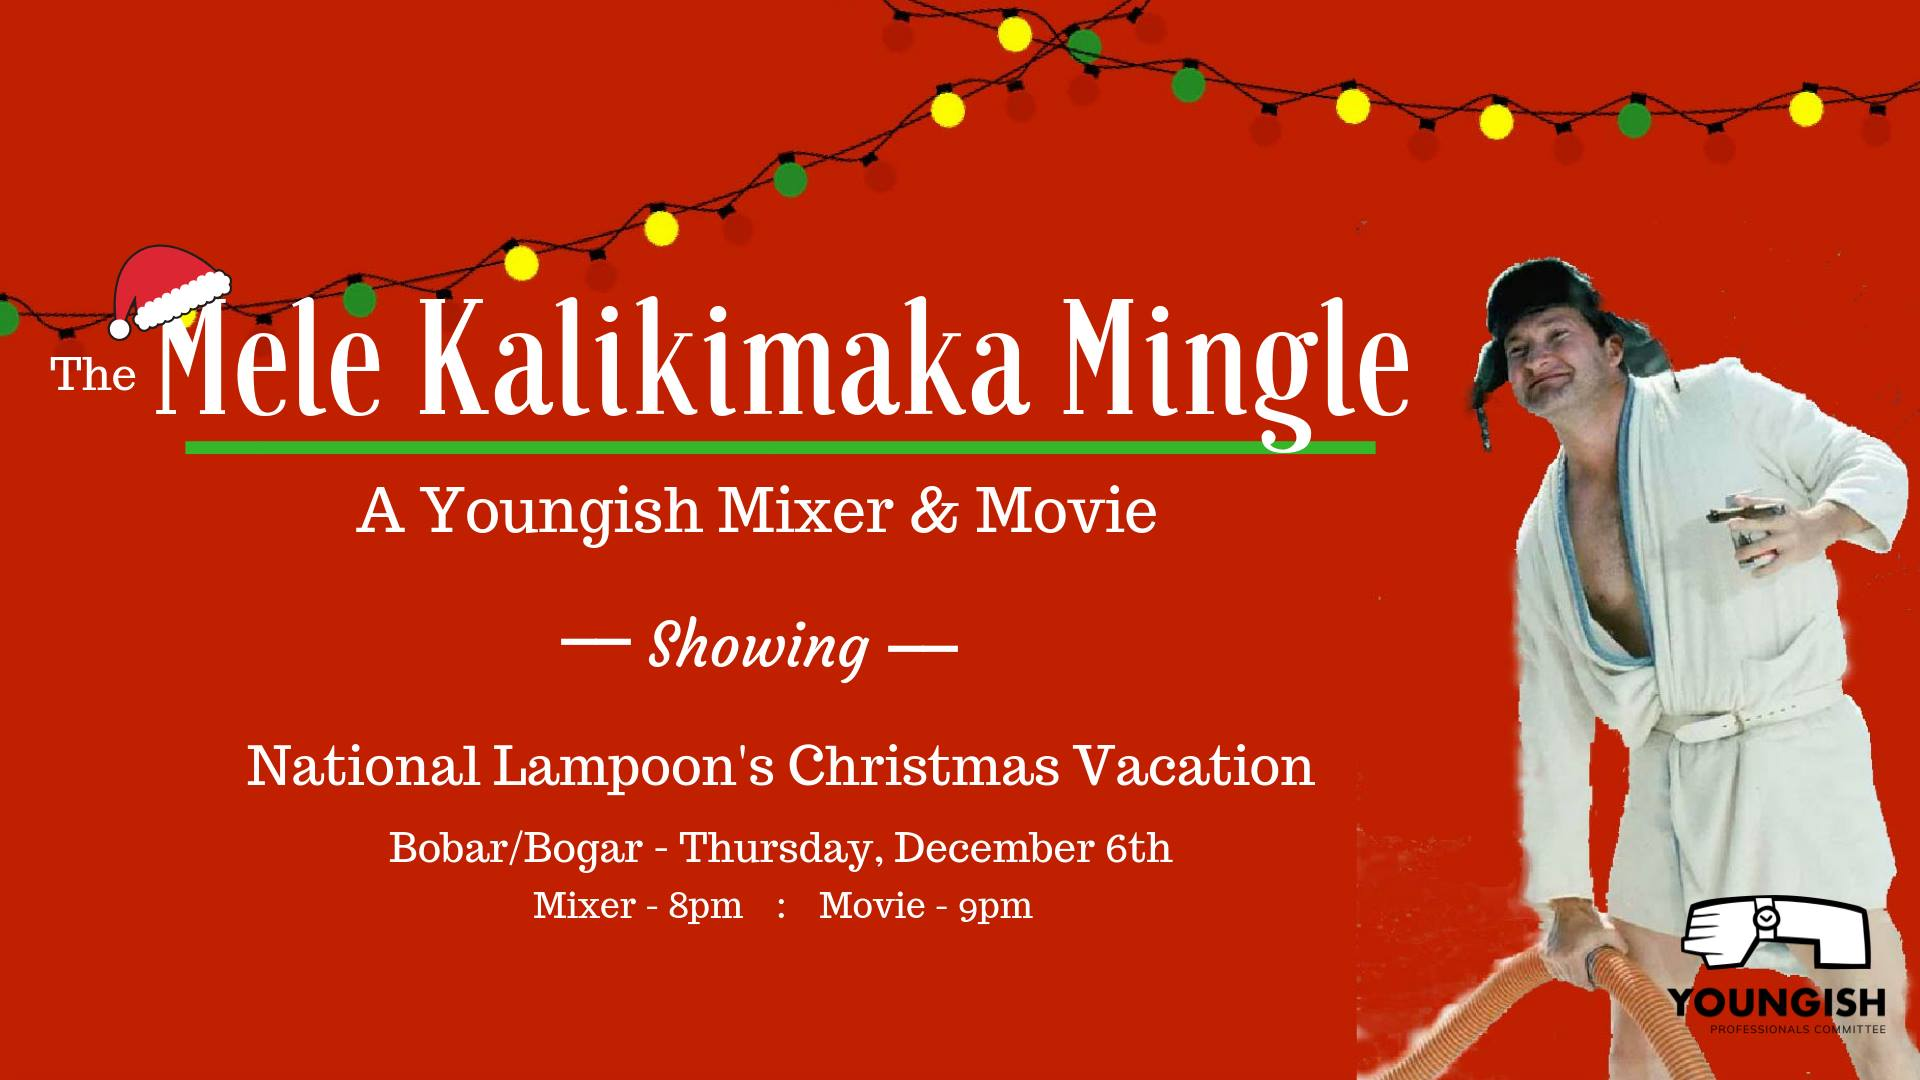 The Mele Kalikimaka Mingle - A Youngish Mixer and Movie